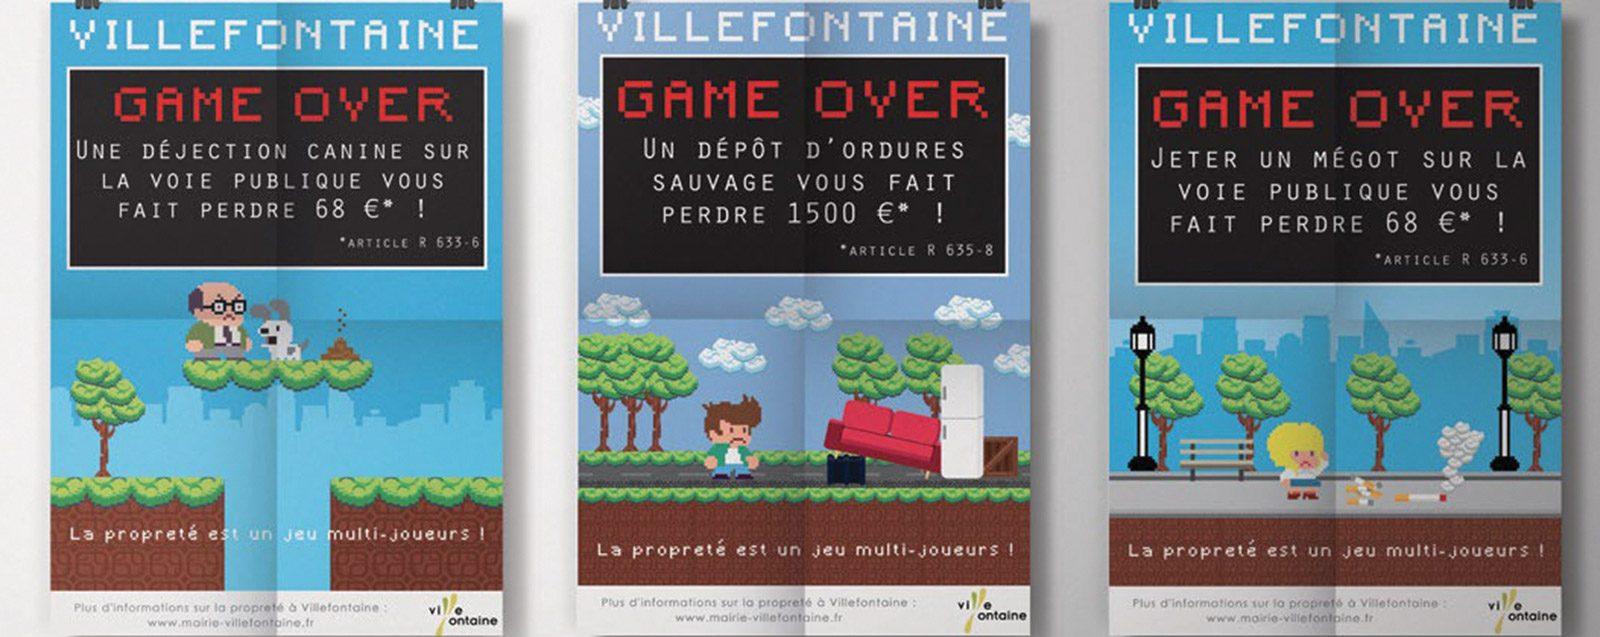 Campagne propreté Villefontaine